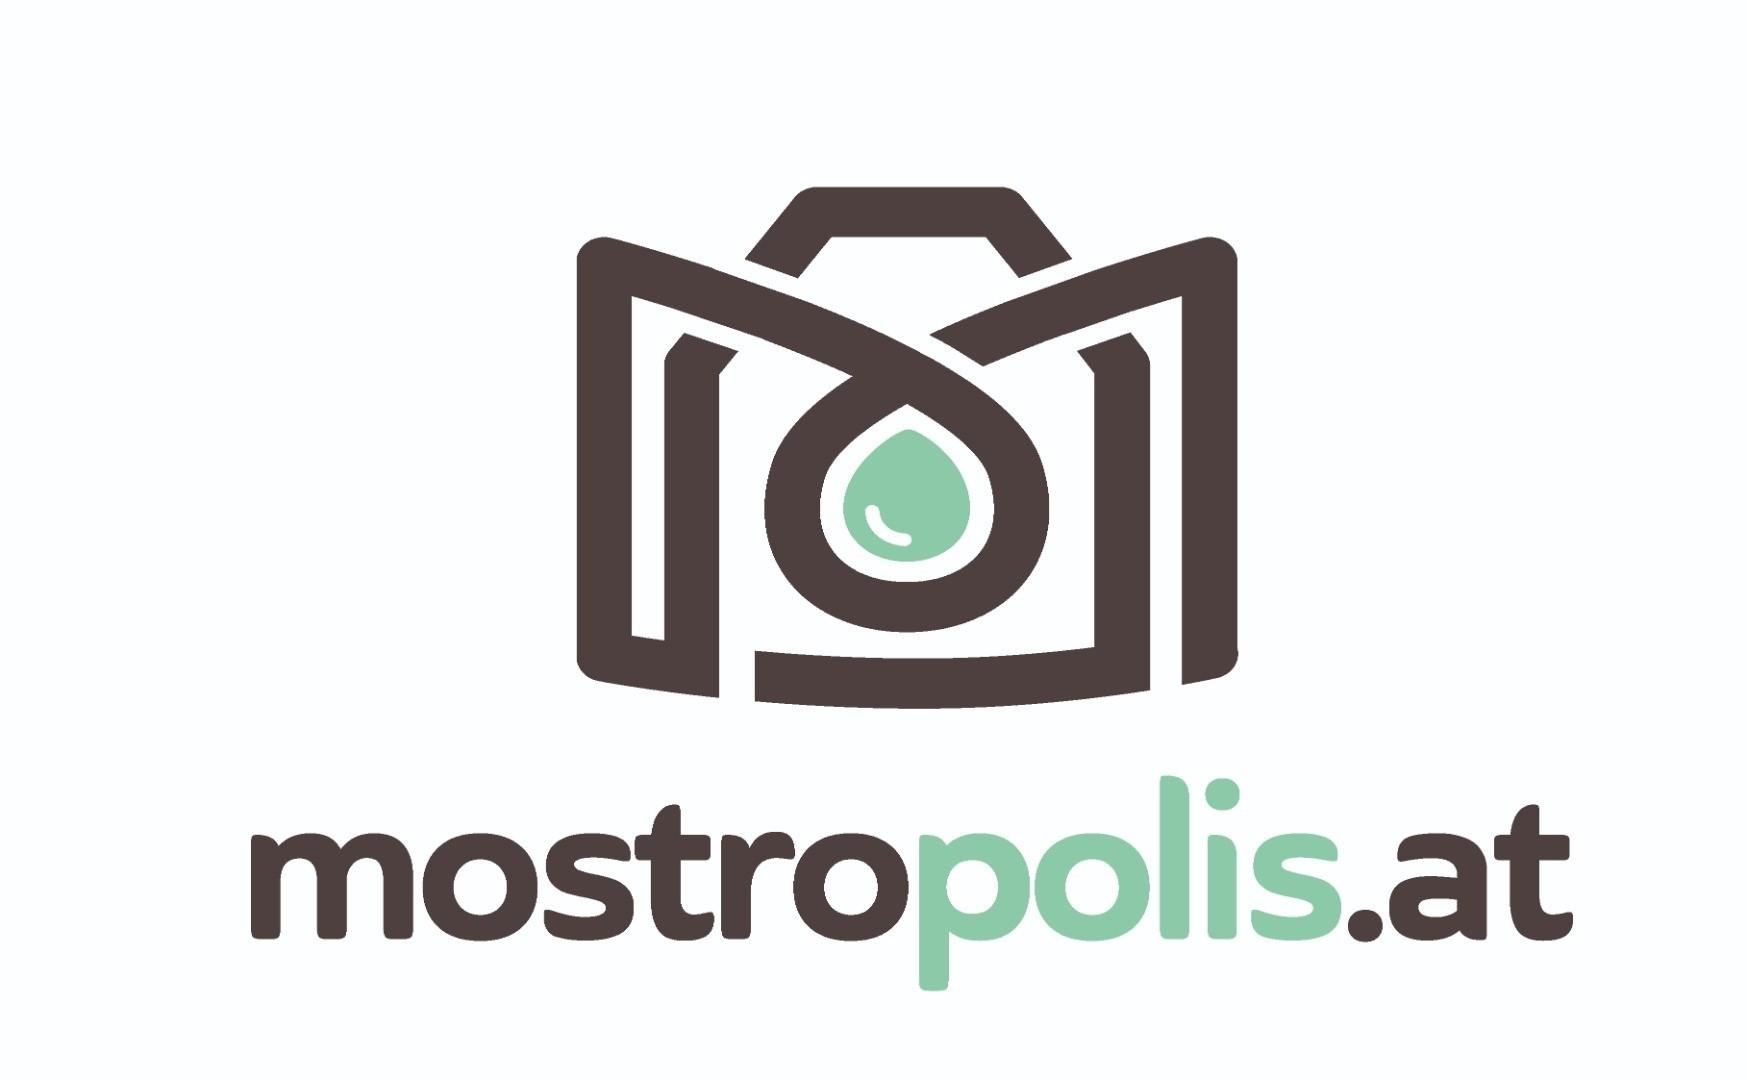 Mostropolis_kurz_cmyk.jpg